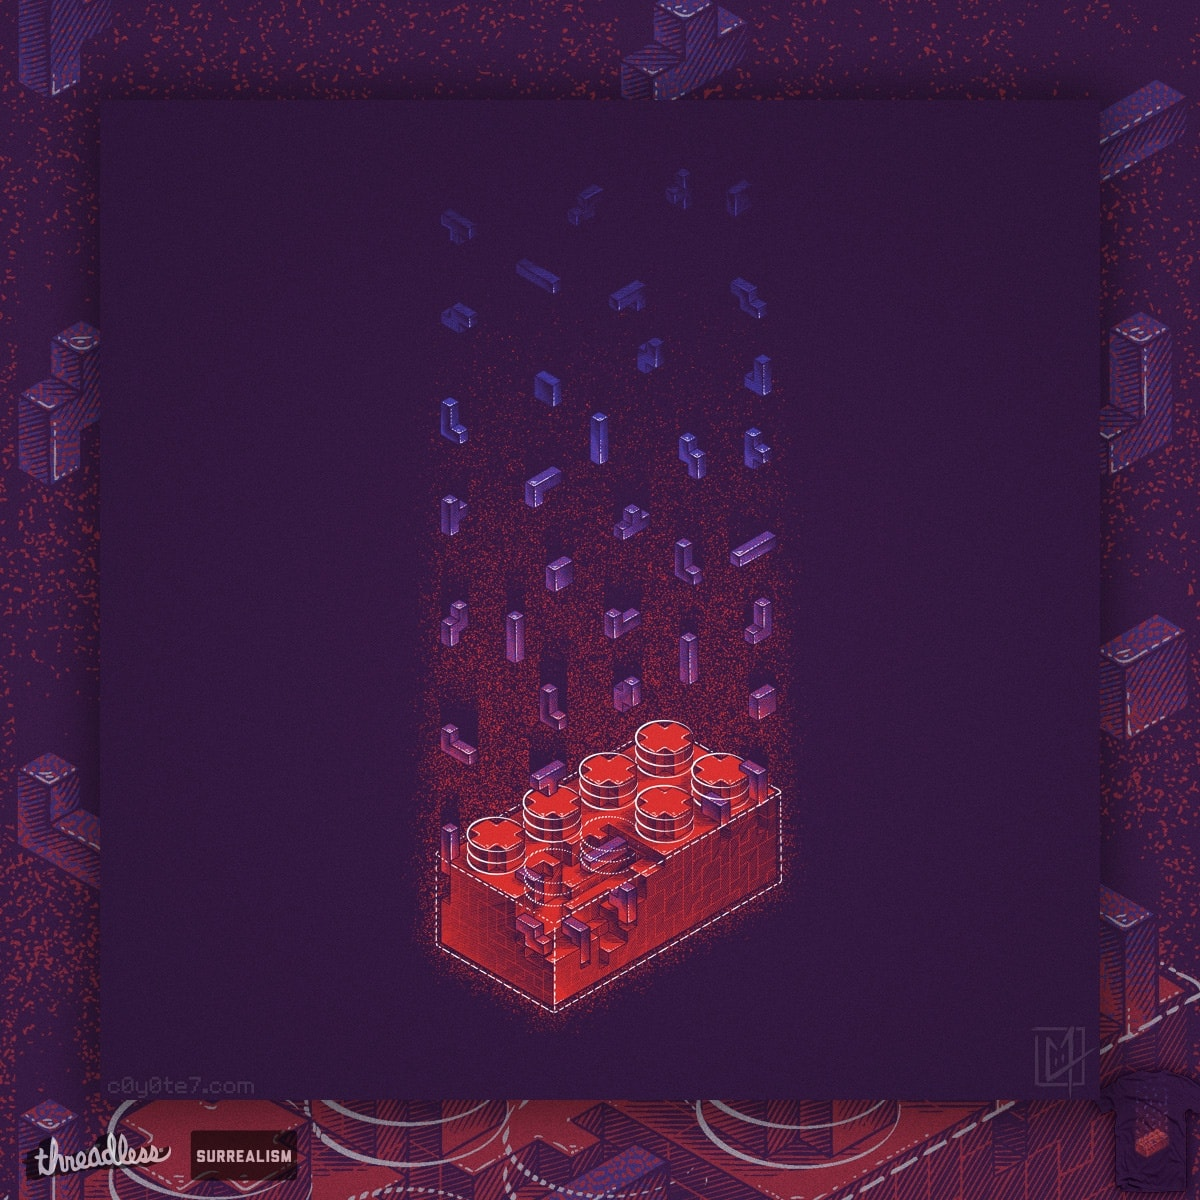 Brick-Ception by c0y0te7 on Threadless